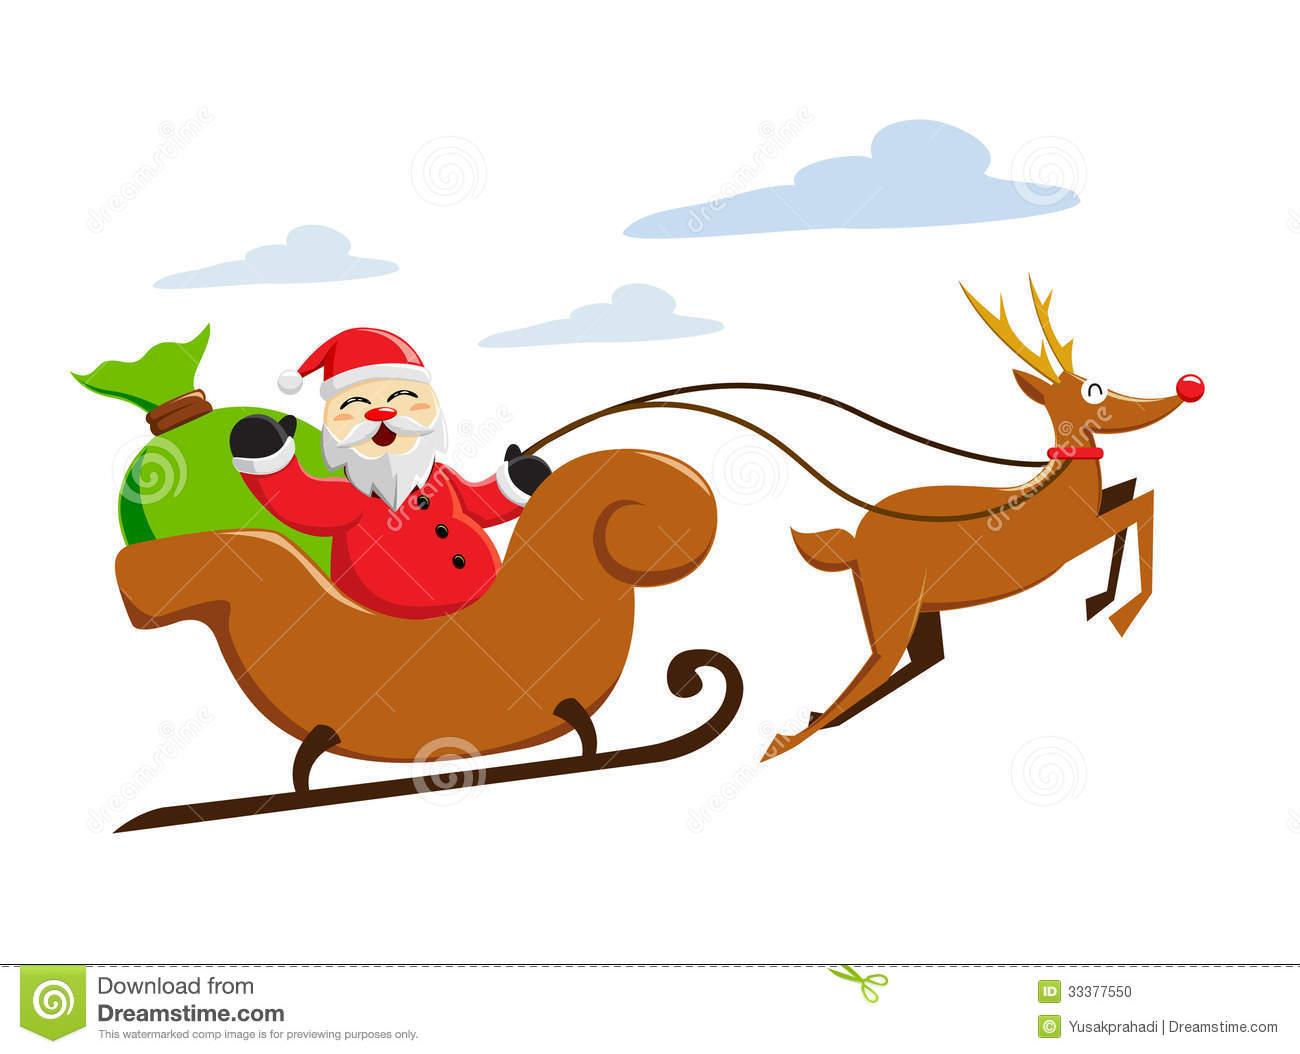 Watch more like Cartoon Santa Sled.